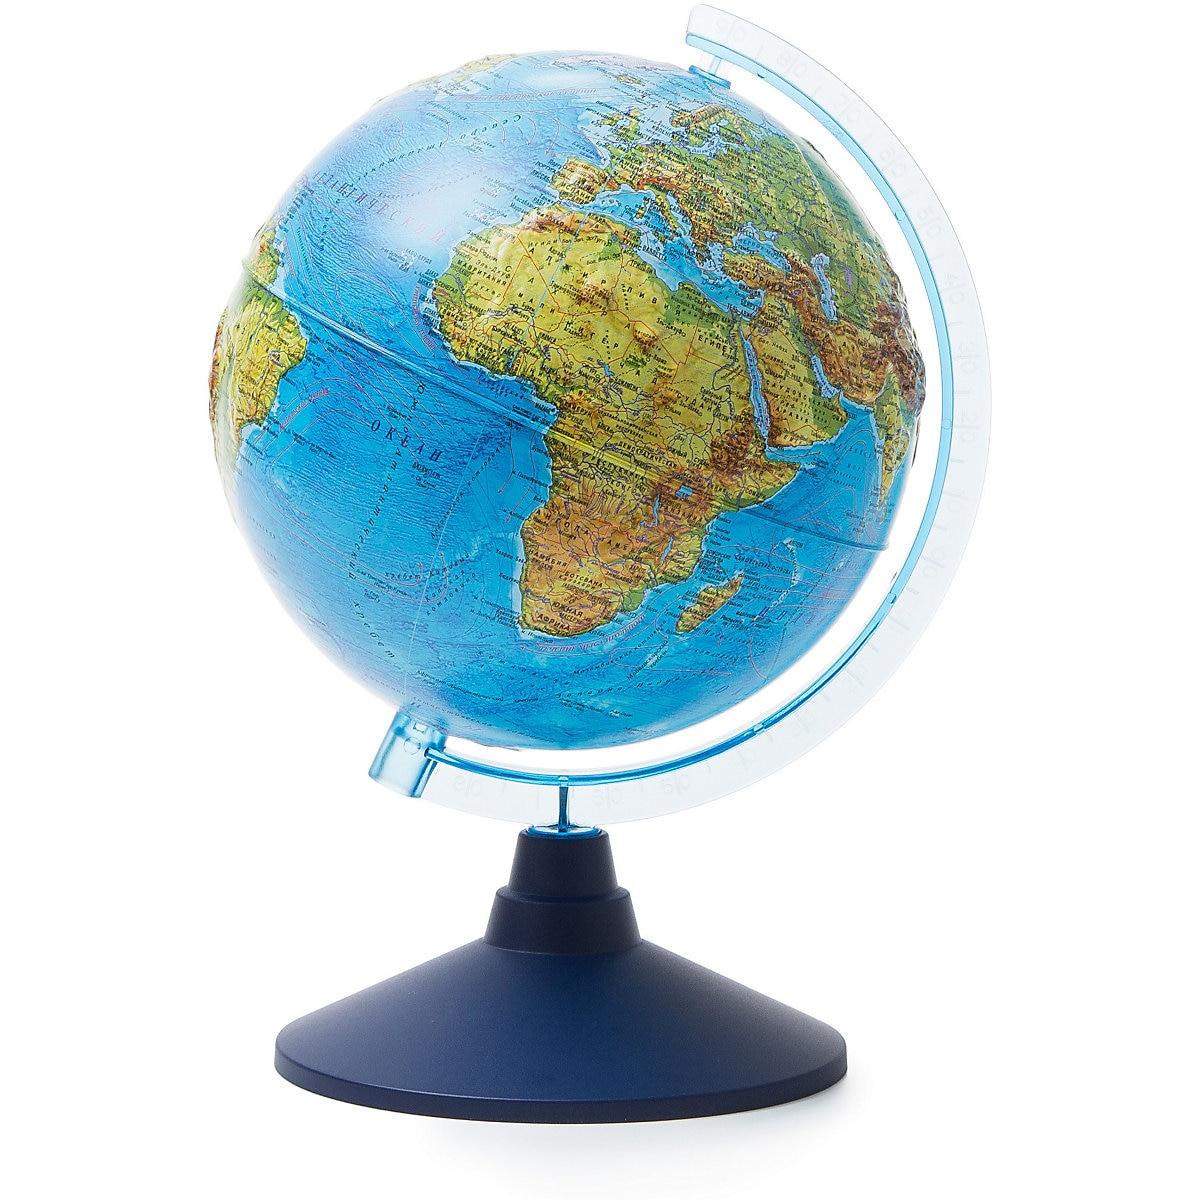 GLOBEN Desk Set 8690515 Globe Accessories Organizer For Office And School Schools Offices MTpromo